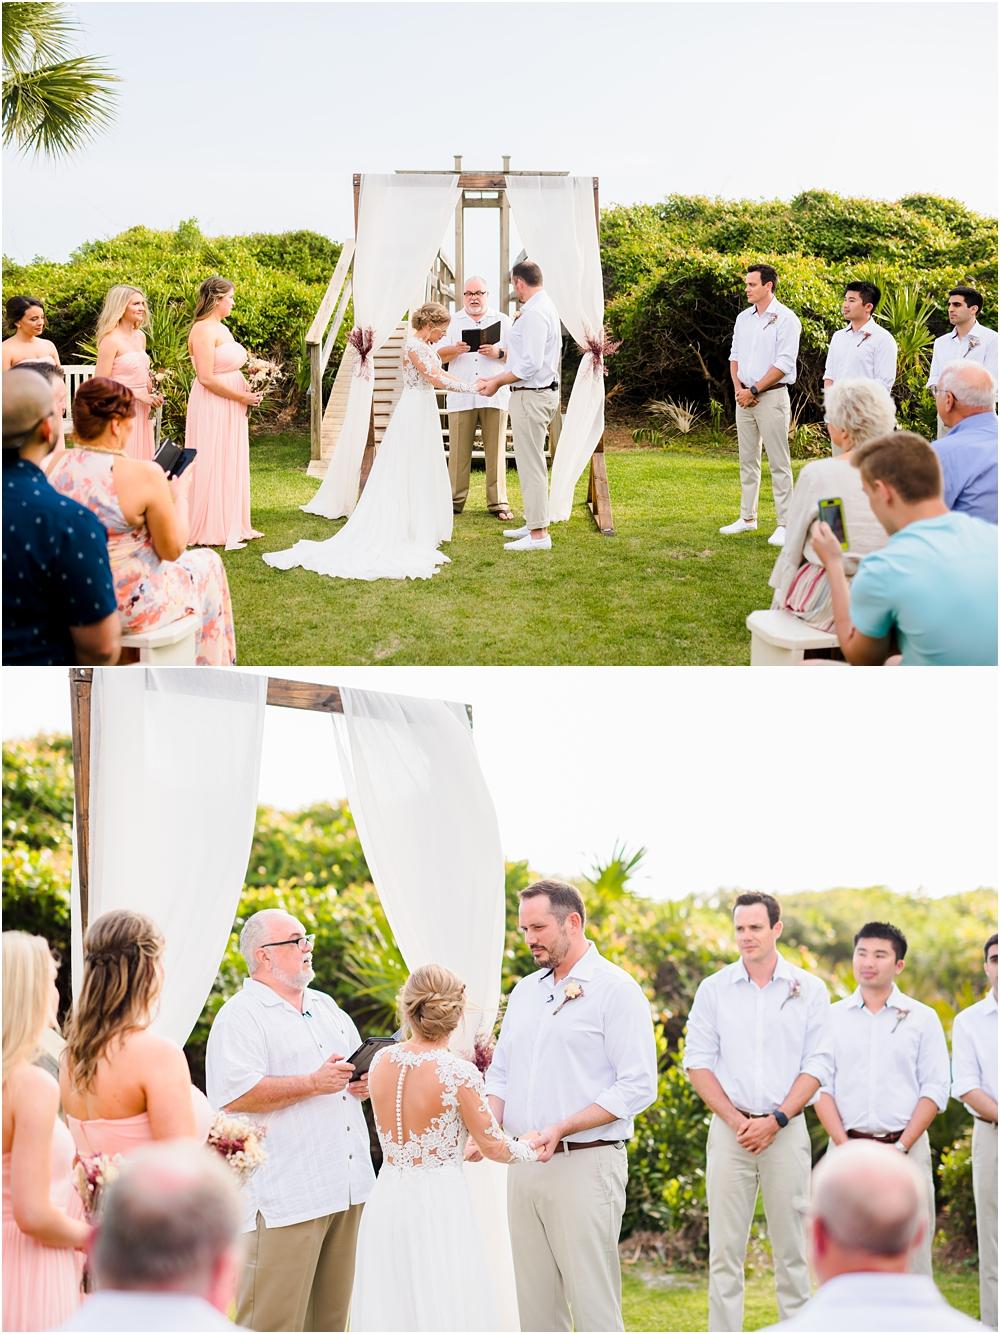 carrillo-triple-crown-santa-rosa-beach-florida-wedding-kiersten-stevenson-photography134.jpg